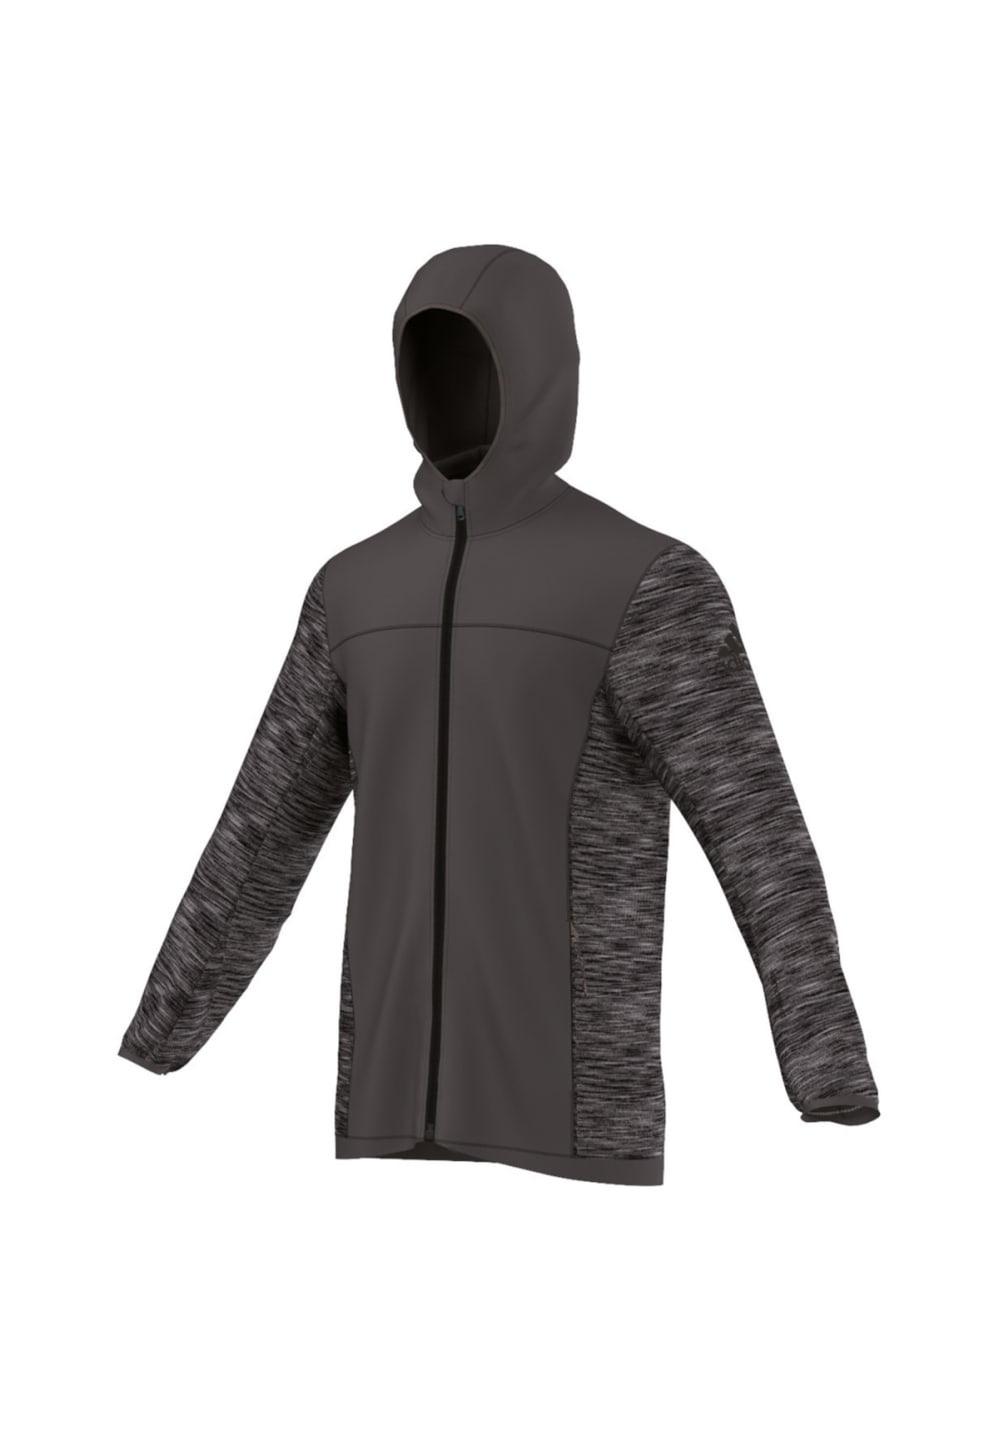 adidas CLIMAHEAT PRIMEKNIT HYBRID JACKET Damen grau Jacken